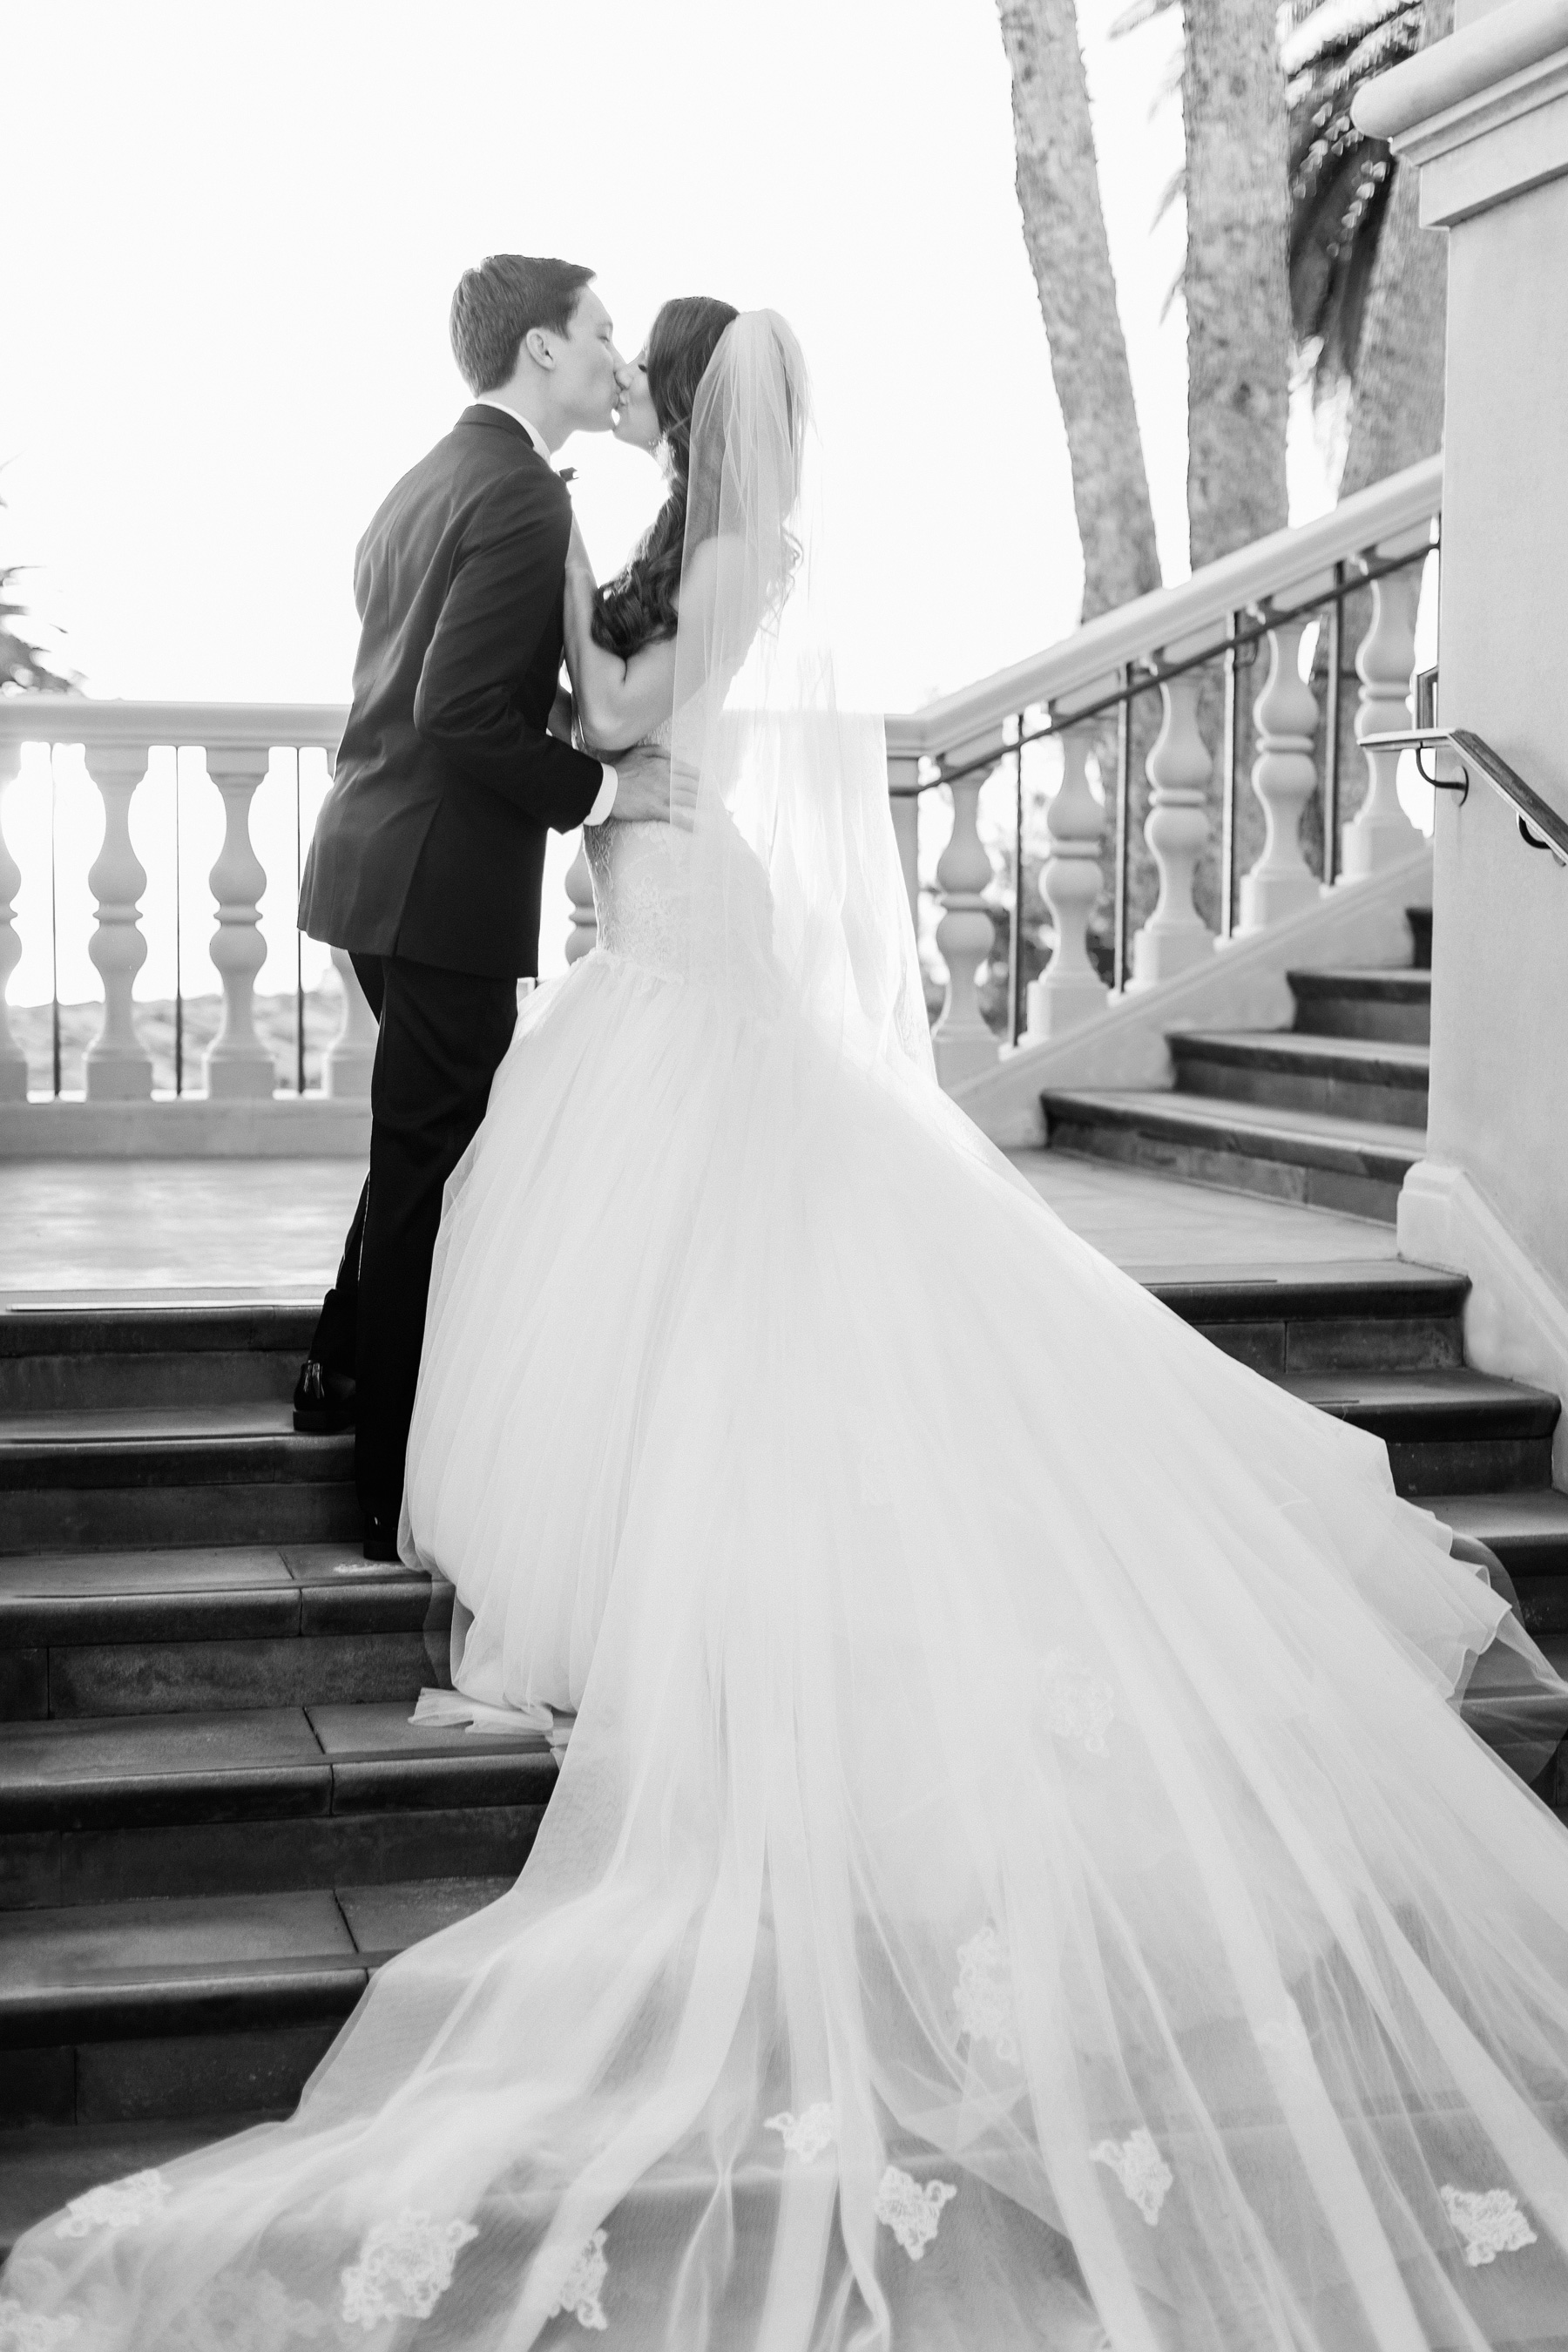 Pelican-hill-wedding-25.JPG